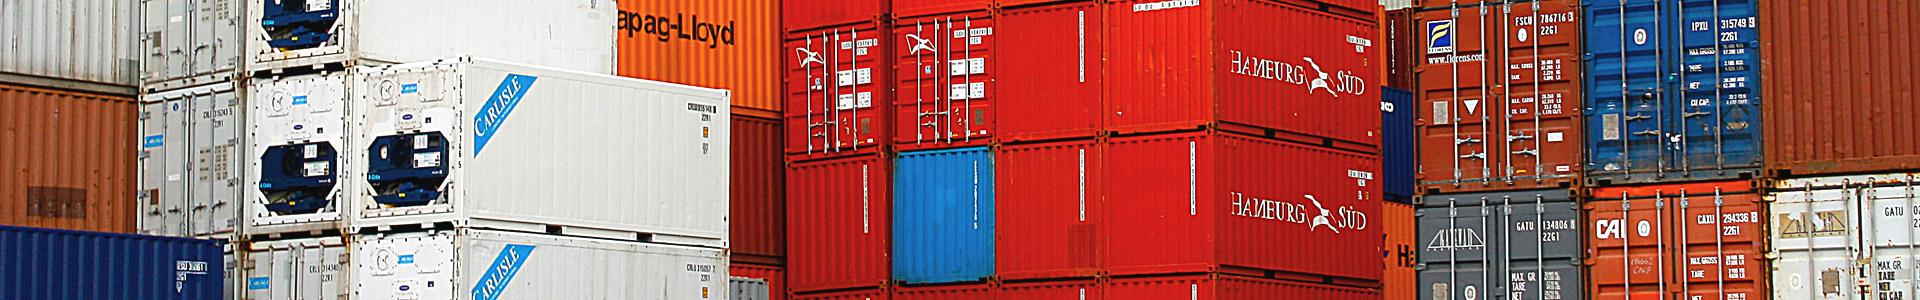 containerhandel1